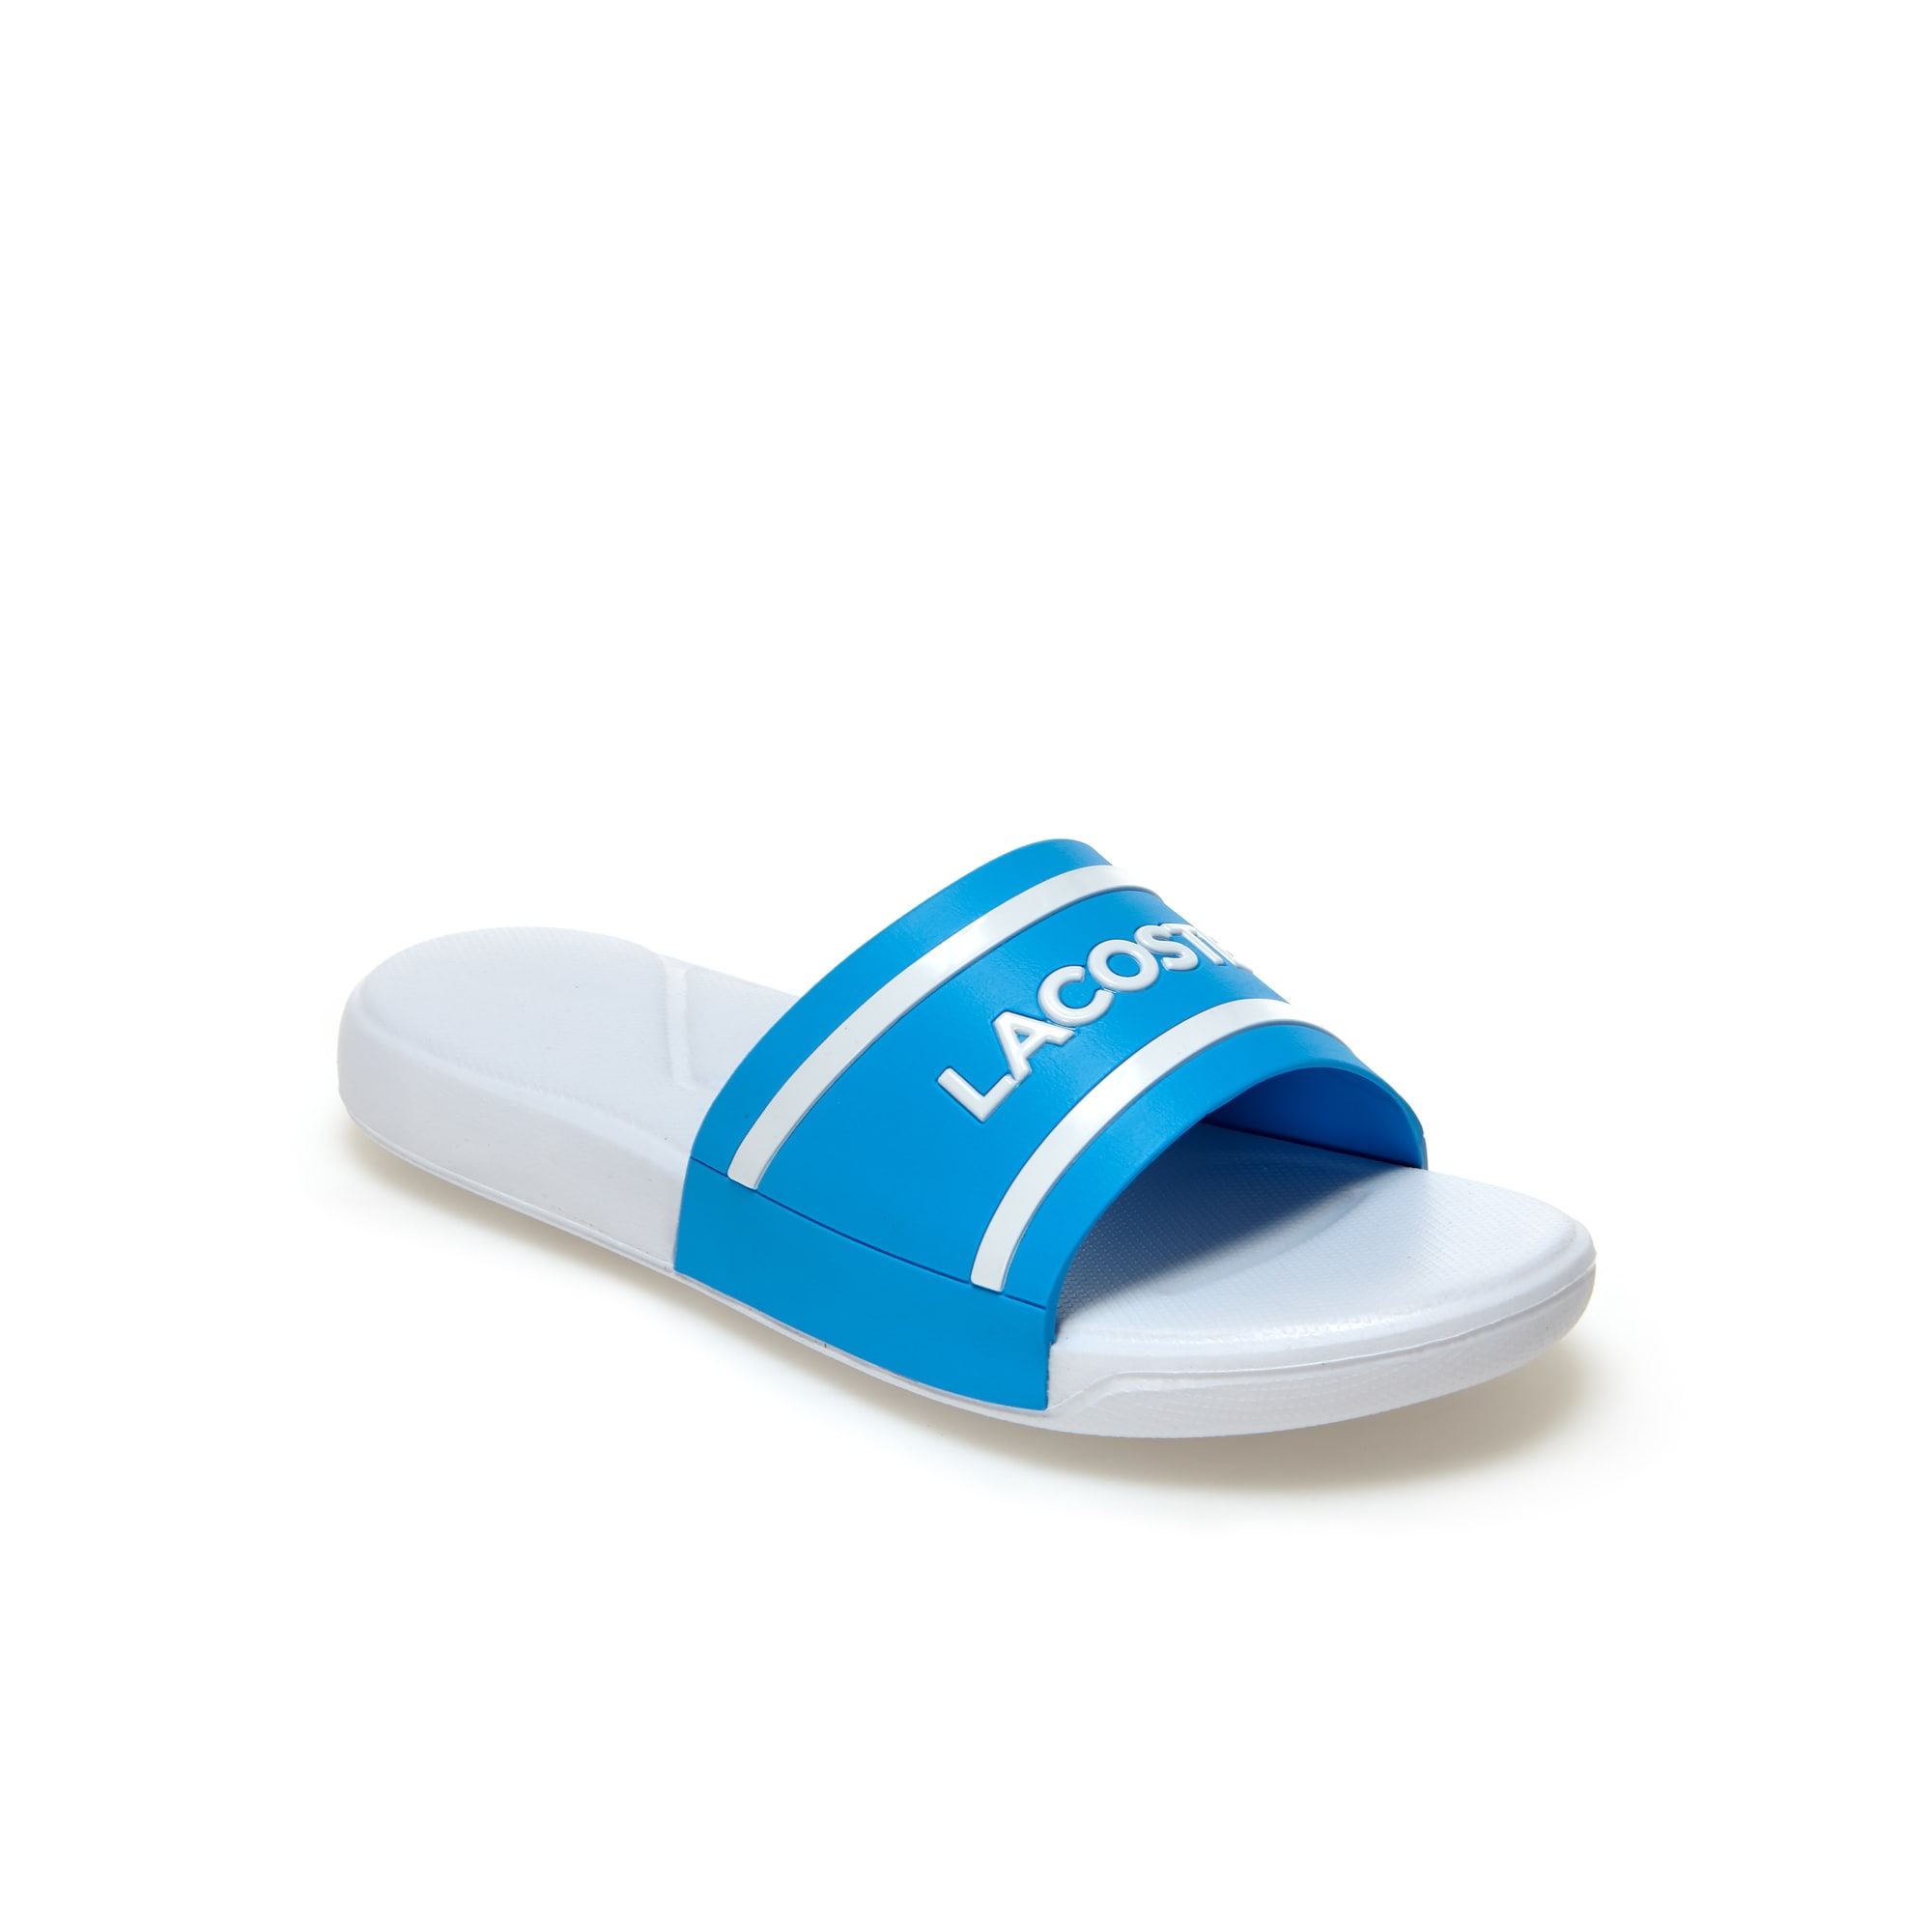 cc0ba52a72 Infant Synthetic L.30 Slides